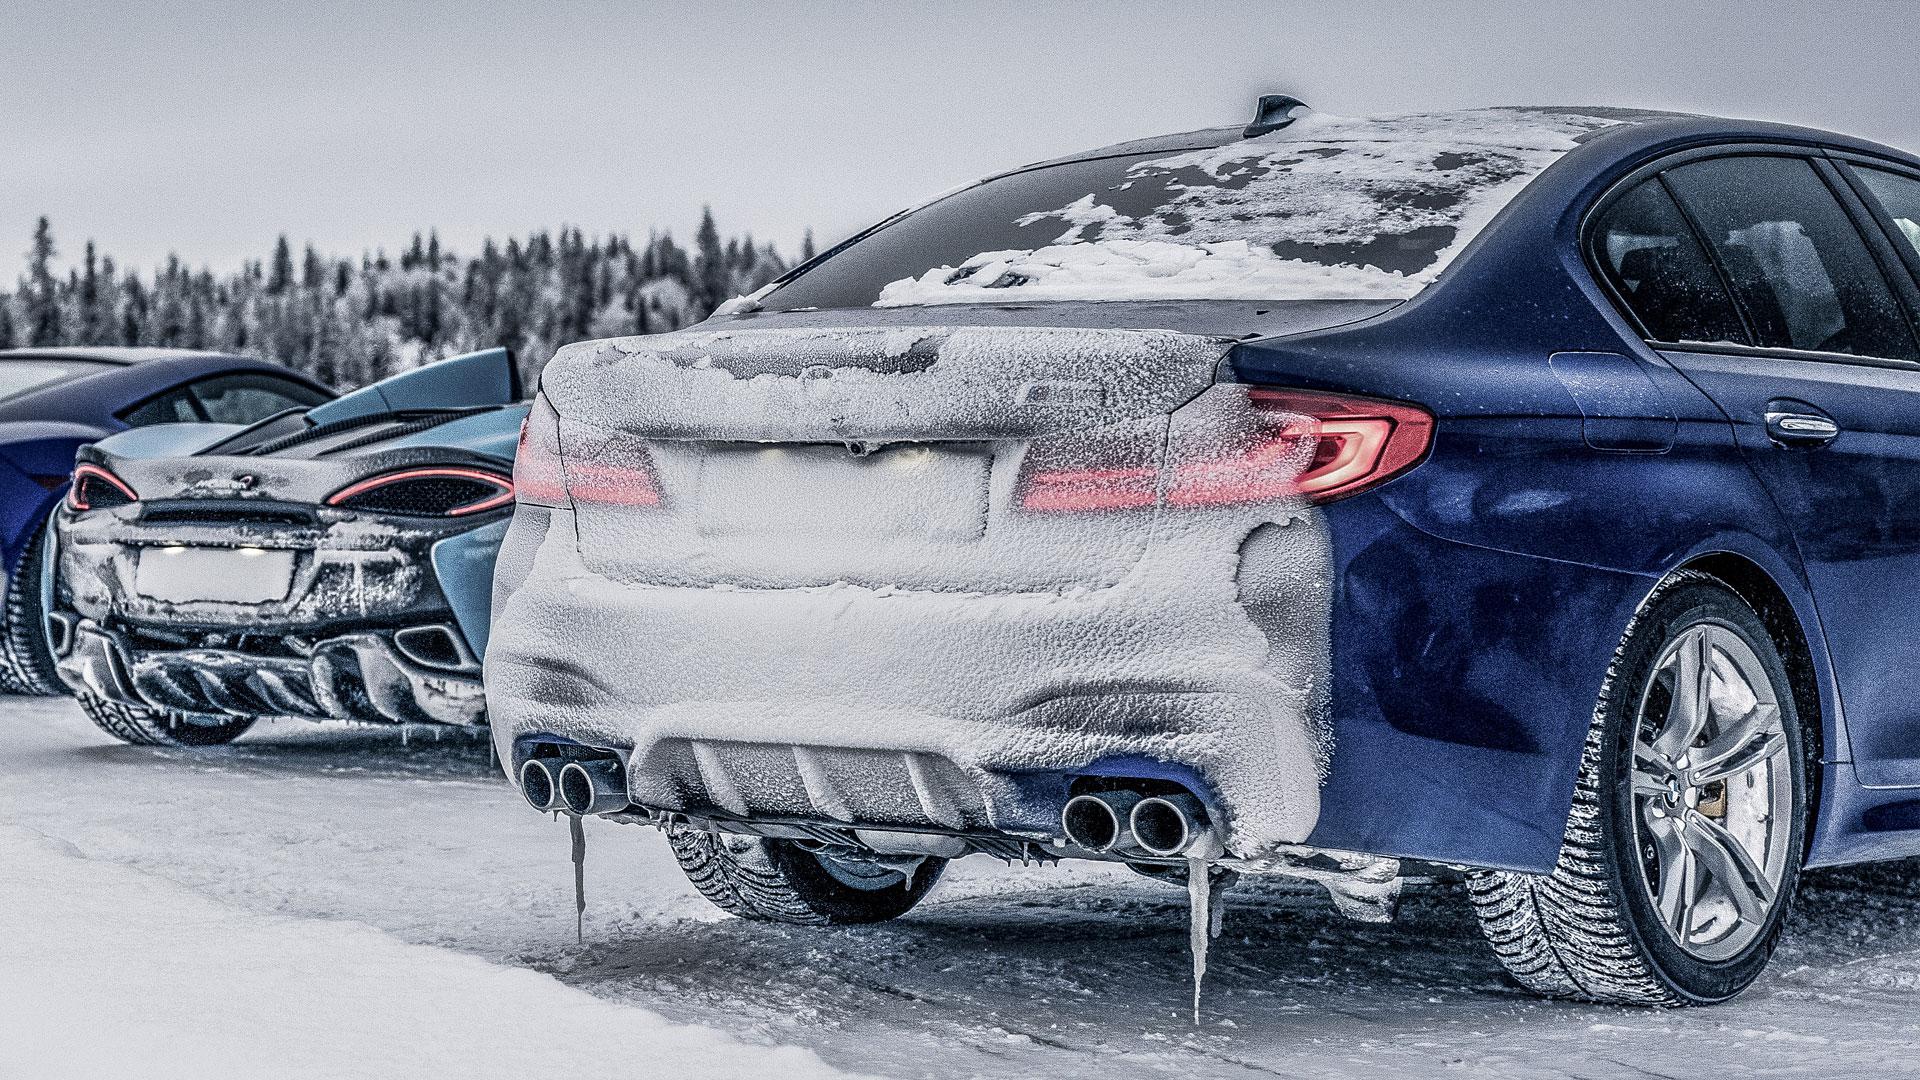 BMW M5 in de sneeuw